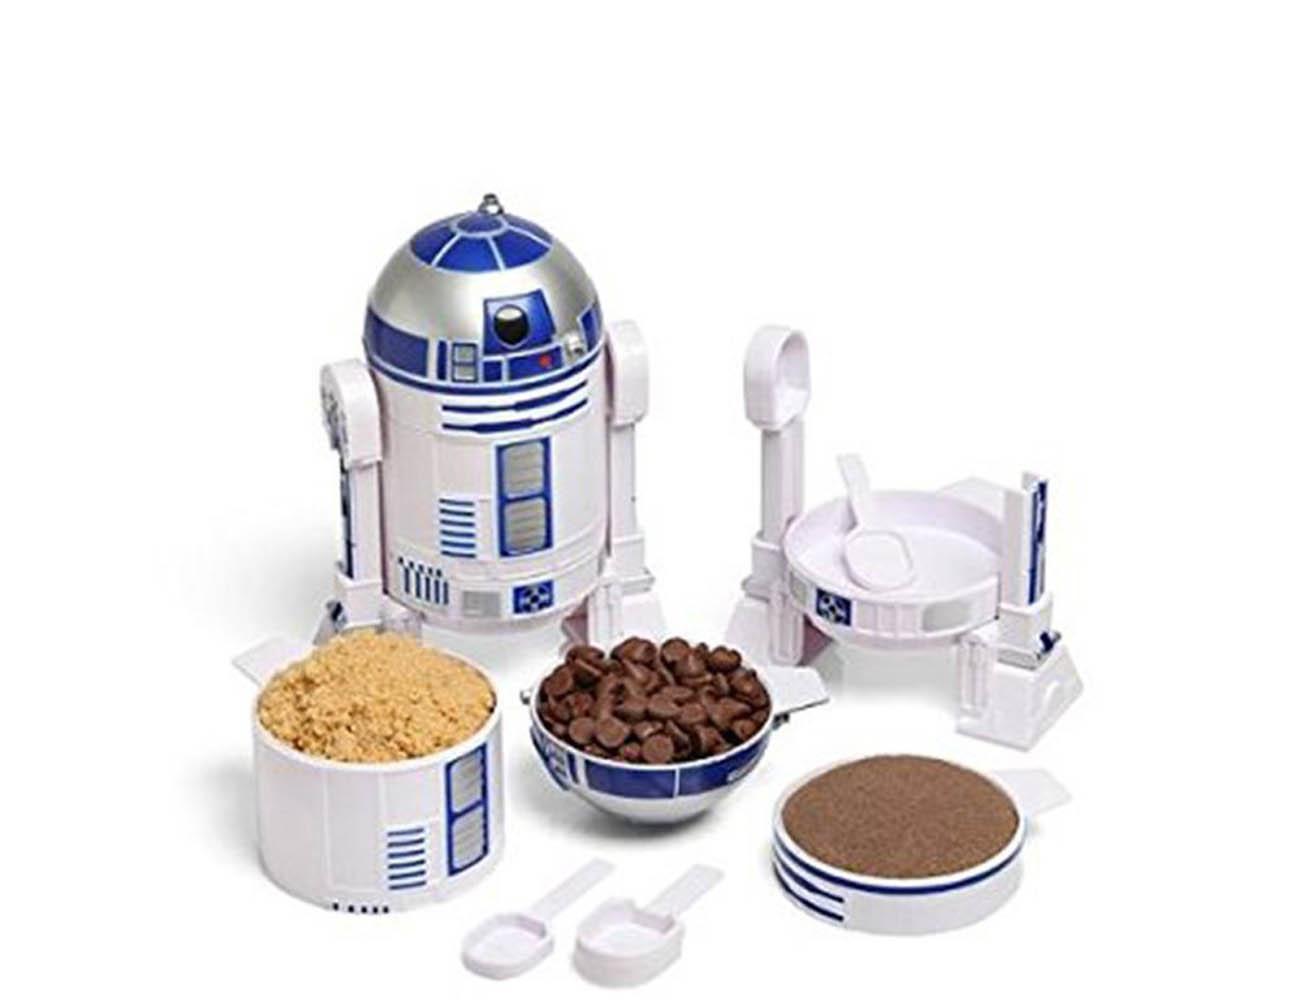 Star Wars Measuring Cup Set